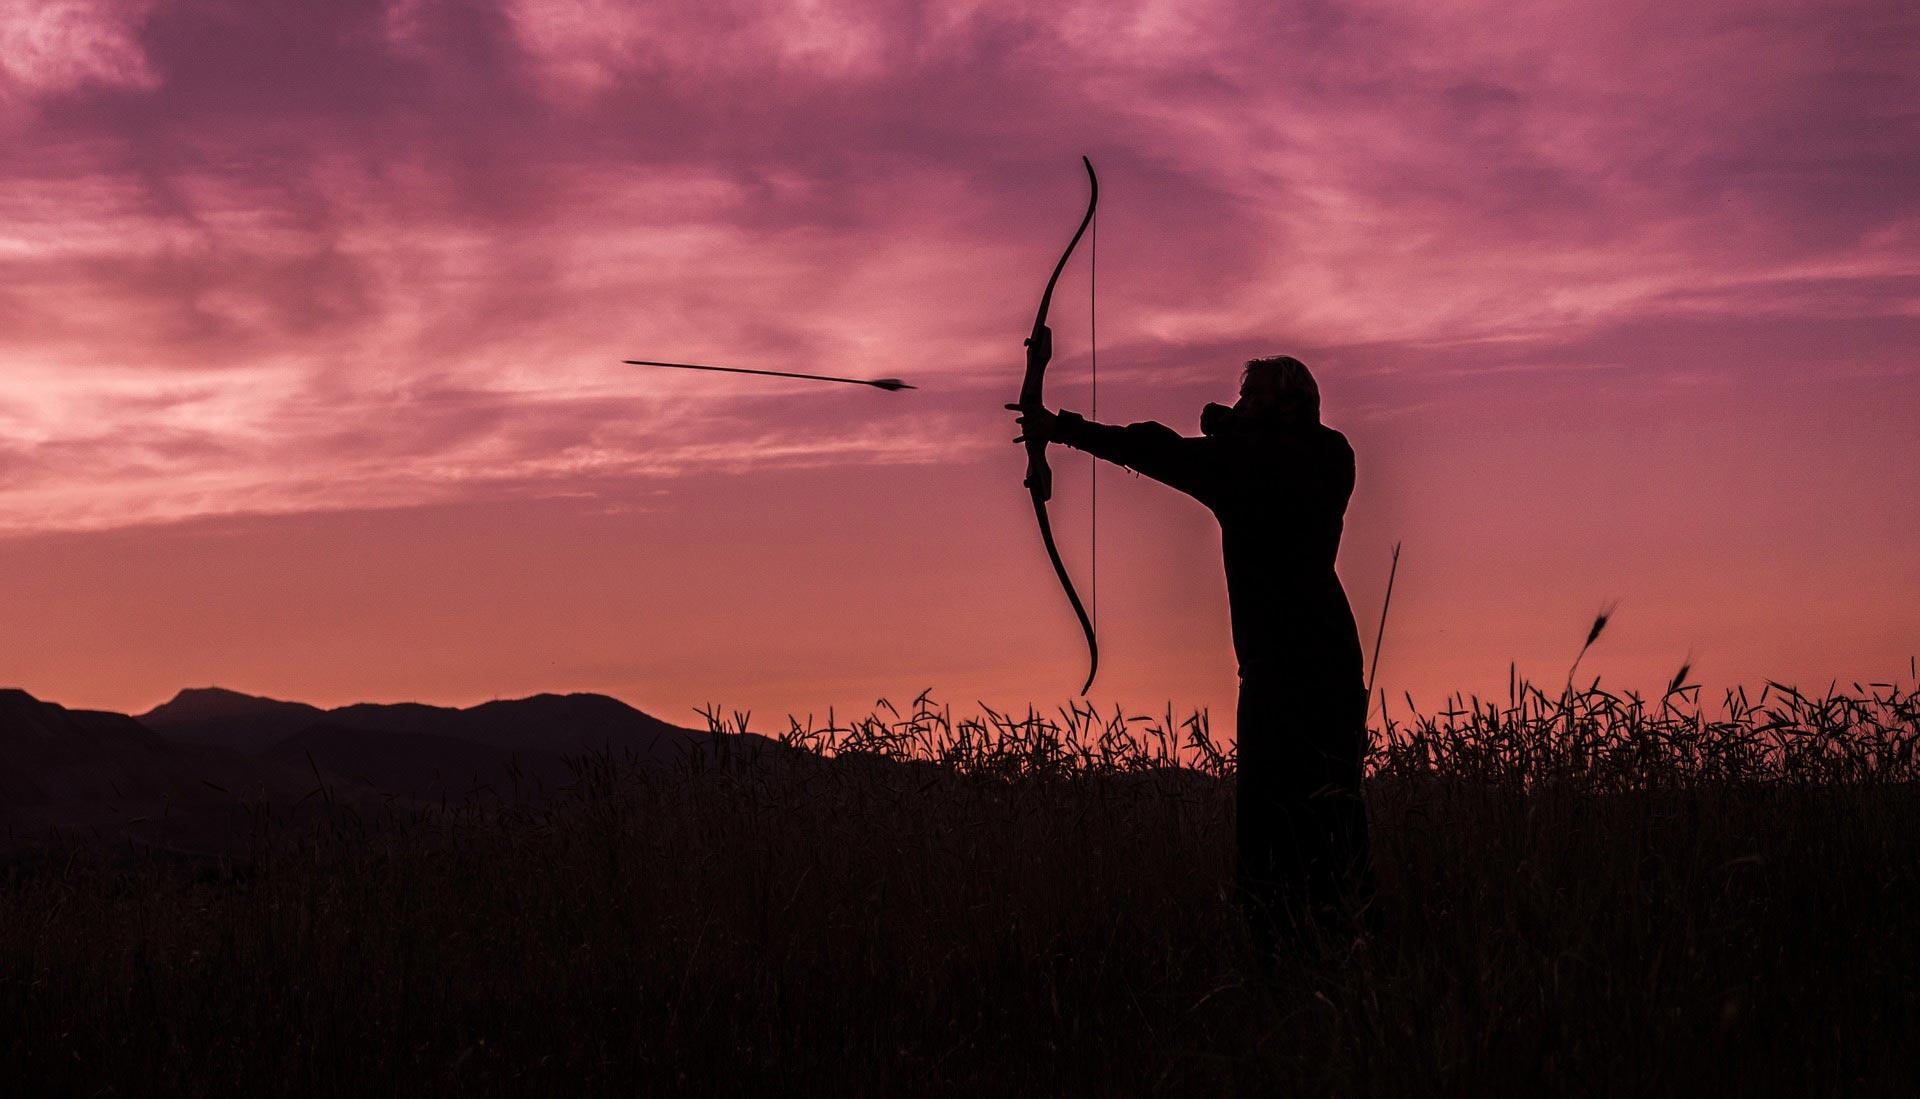 Bogenschütze im Sonnenuntergang.